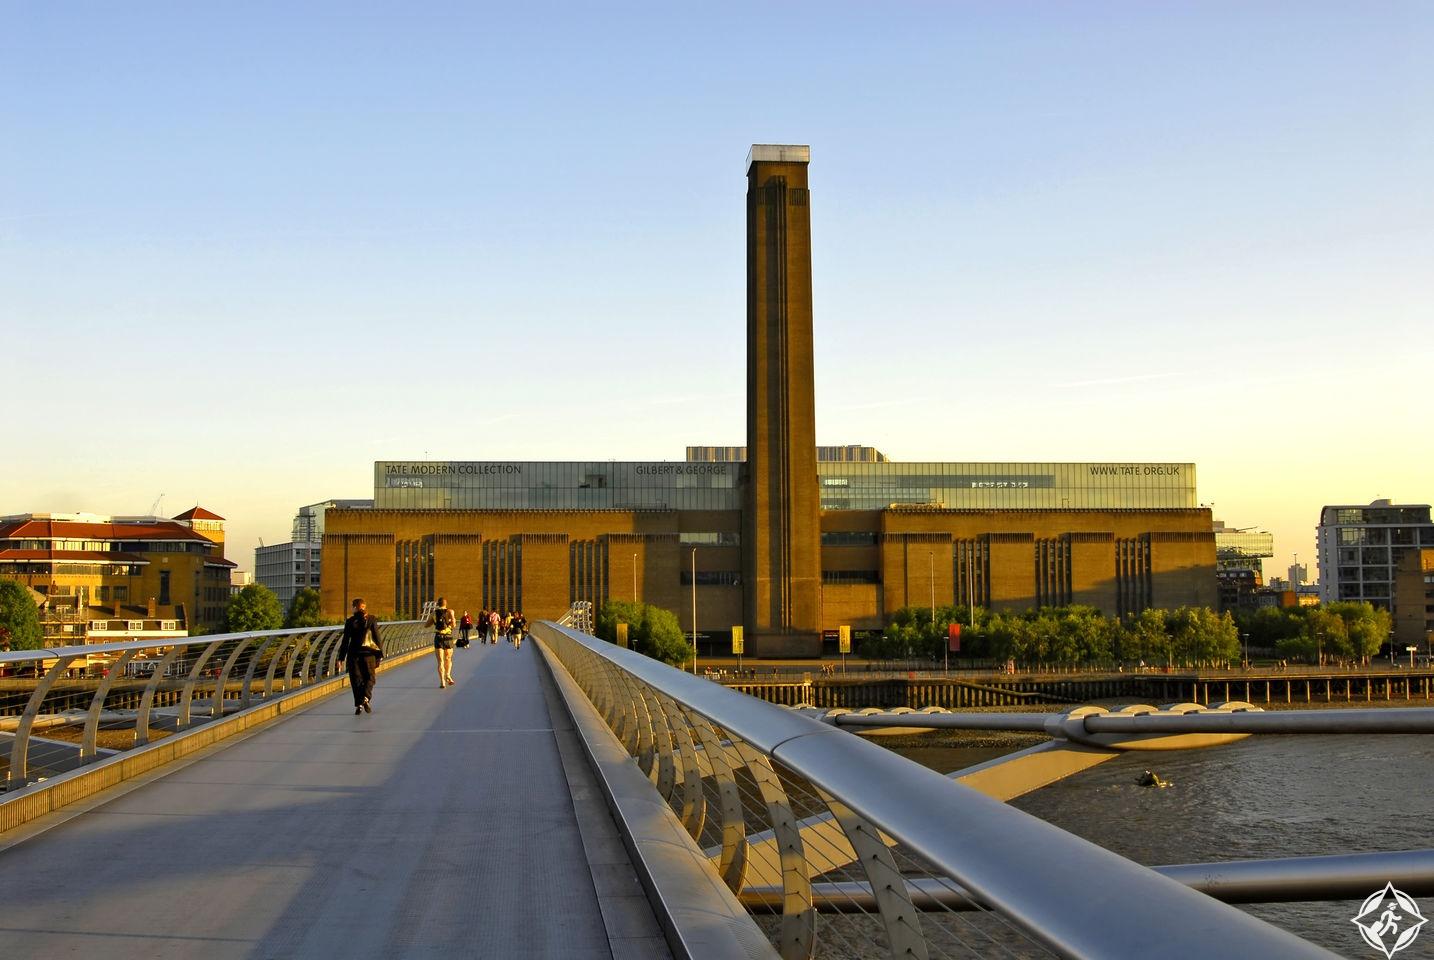 متحف تیت مودرن في لندن Tate modern